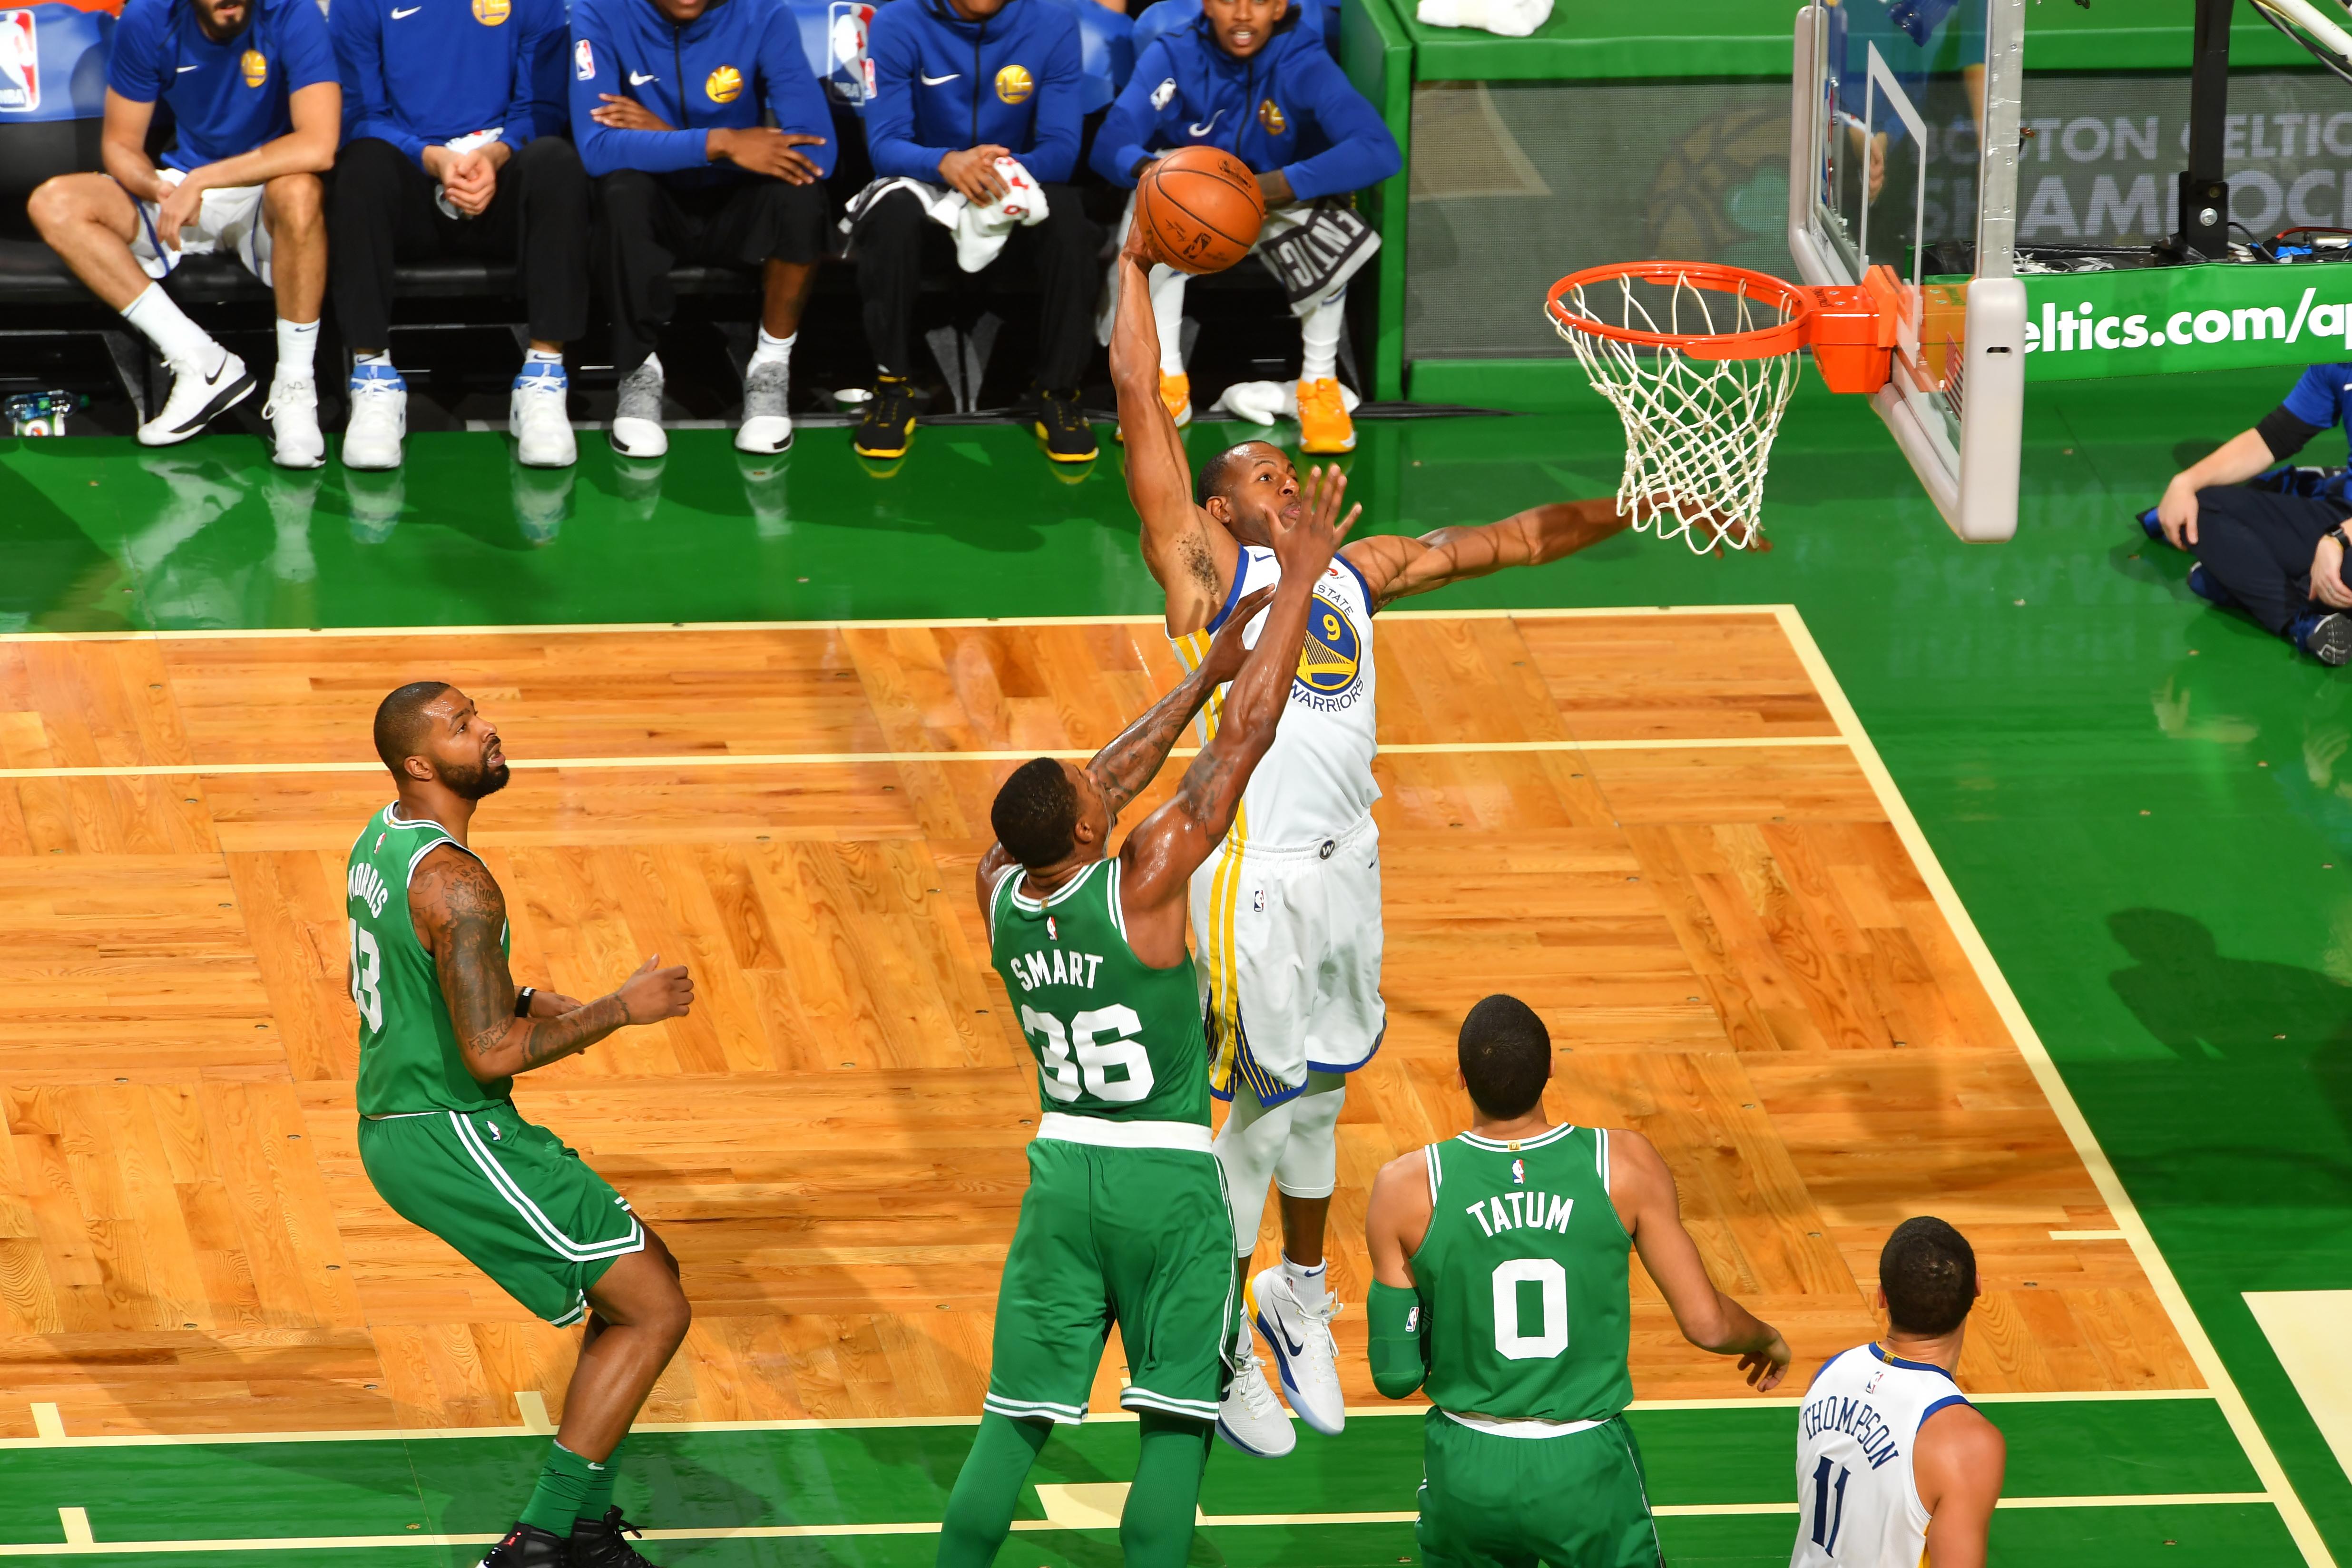 After friend's death, Brown fuels Celtics win over Warriors